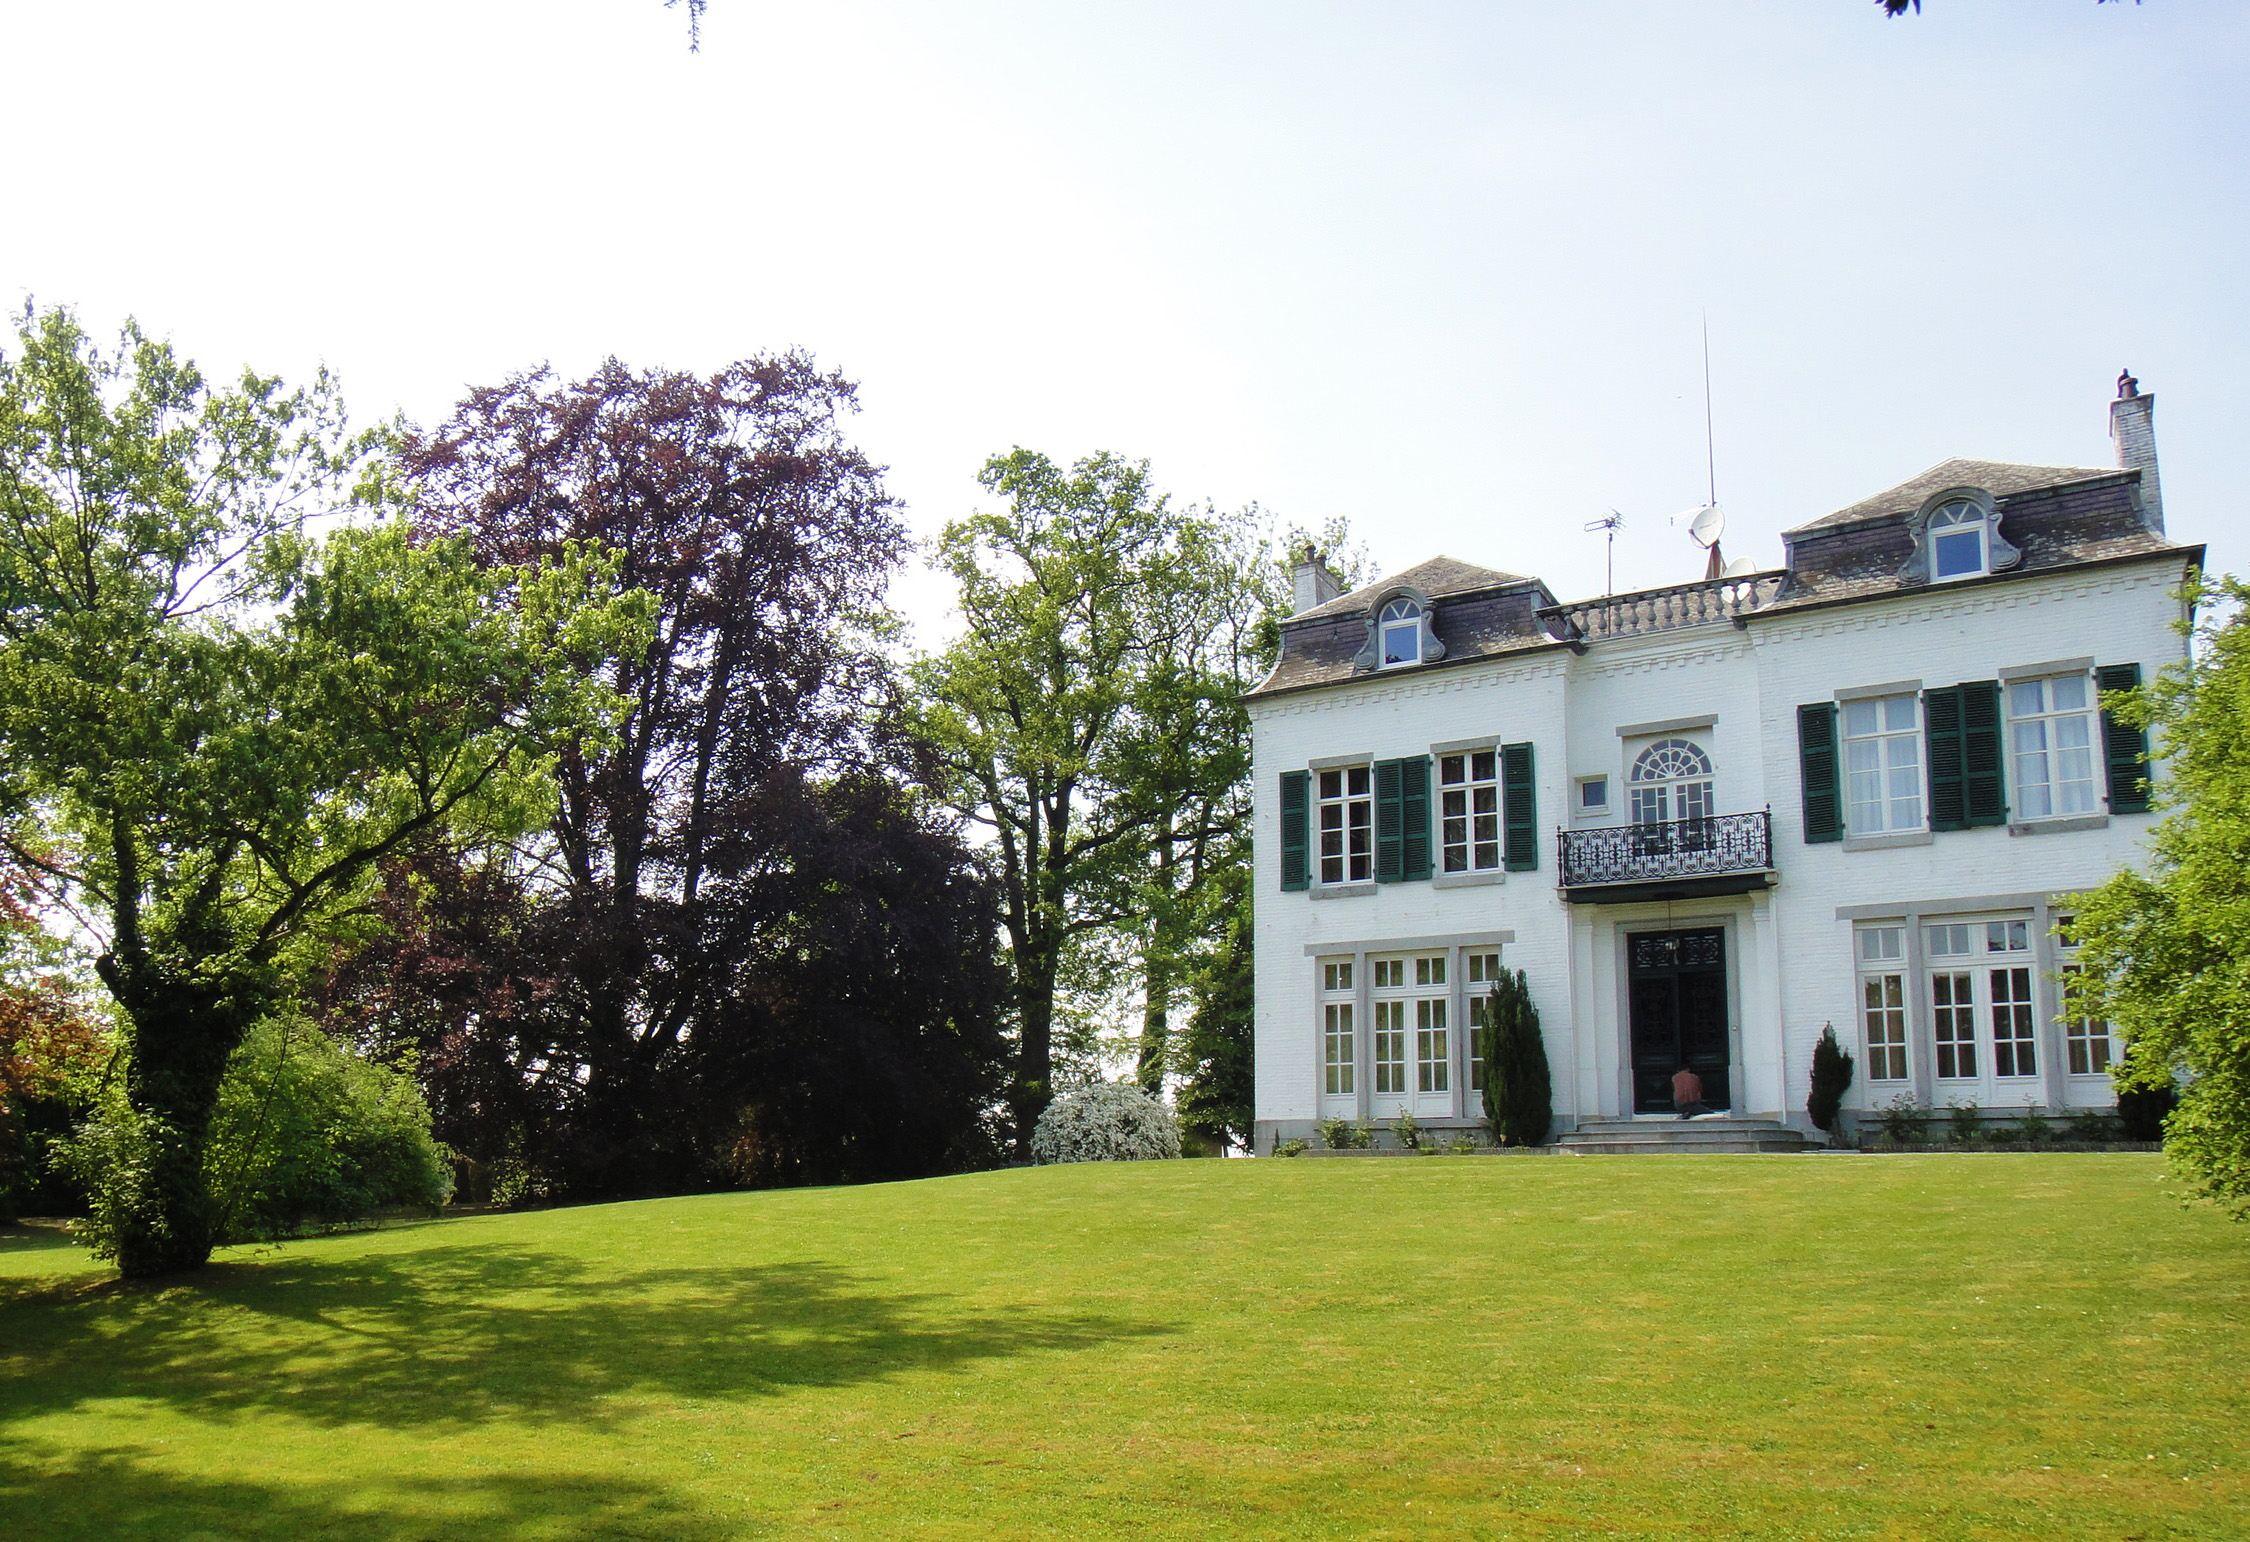 Property For Sale at SAINS DU NORD, Wonderful Property, 510 m2 hab, 10 Ch. 1,5Ha